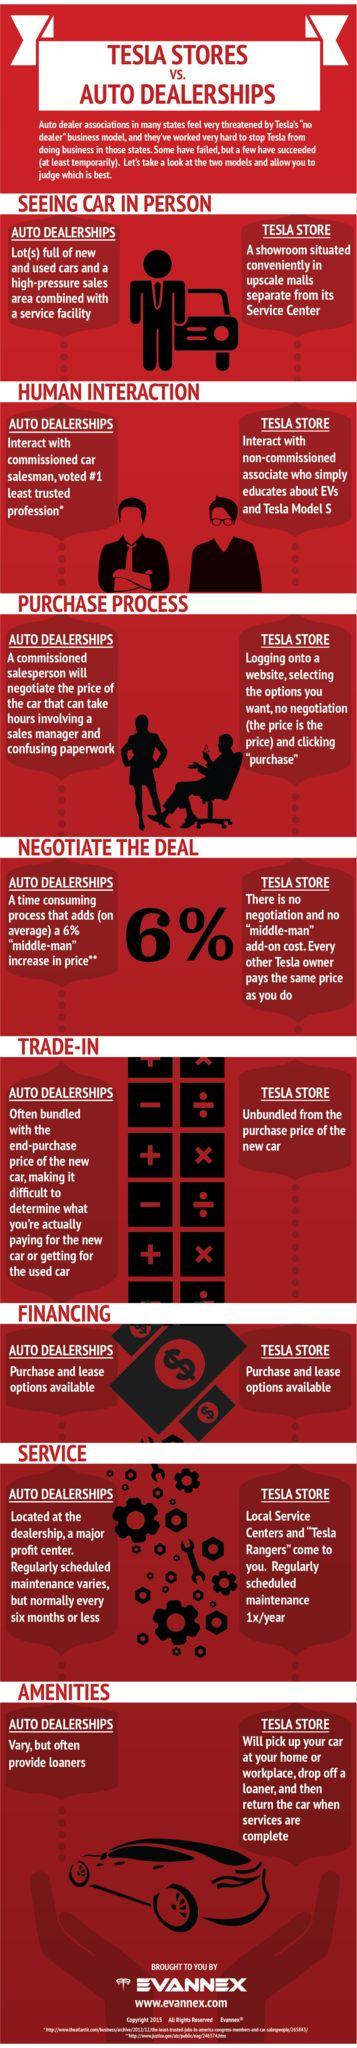 [Infographic] Tesla Stores vs. Franchise Auto Dealerships, for more, visit: www.evannex.com